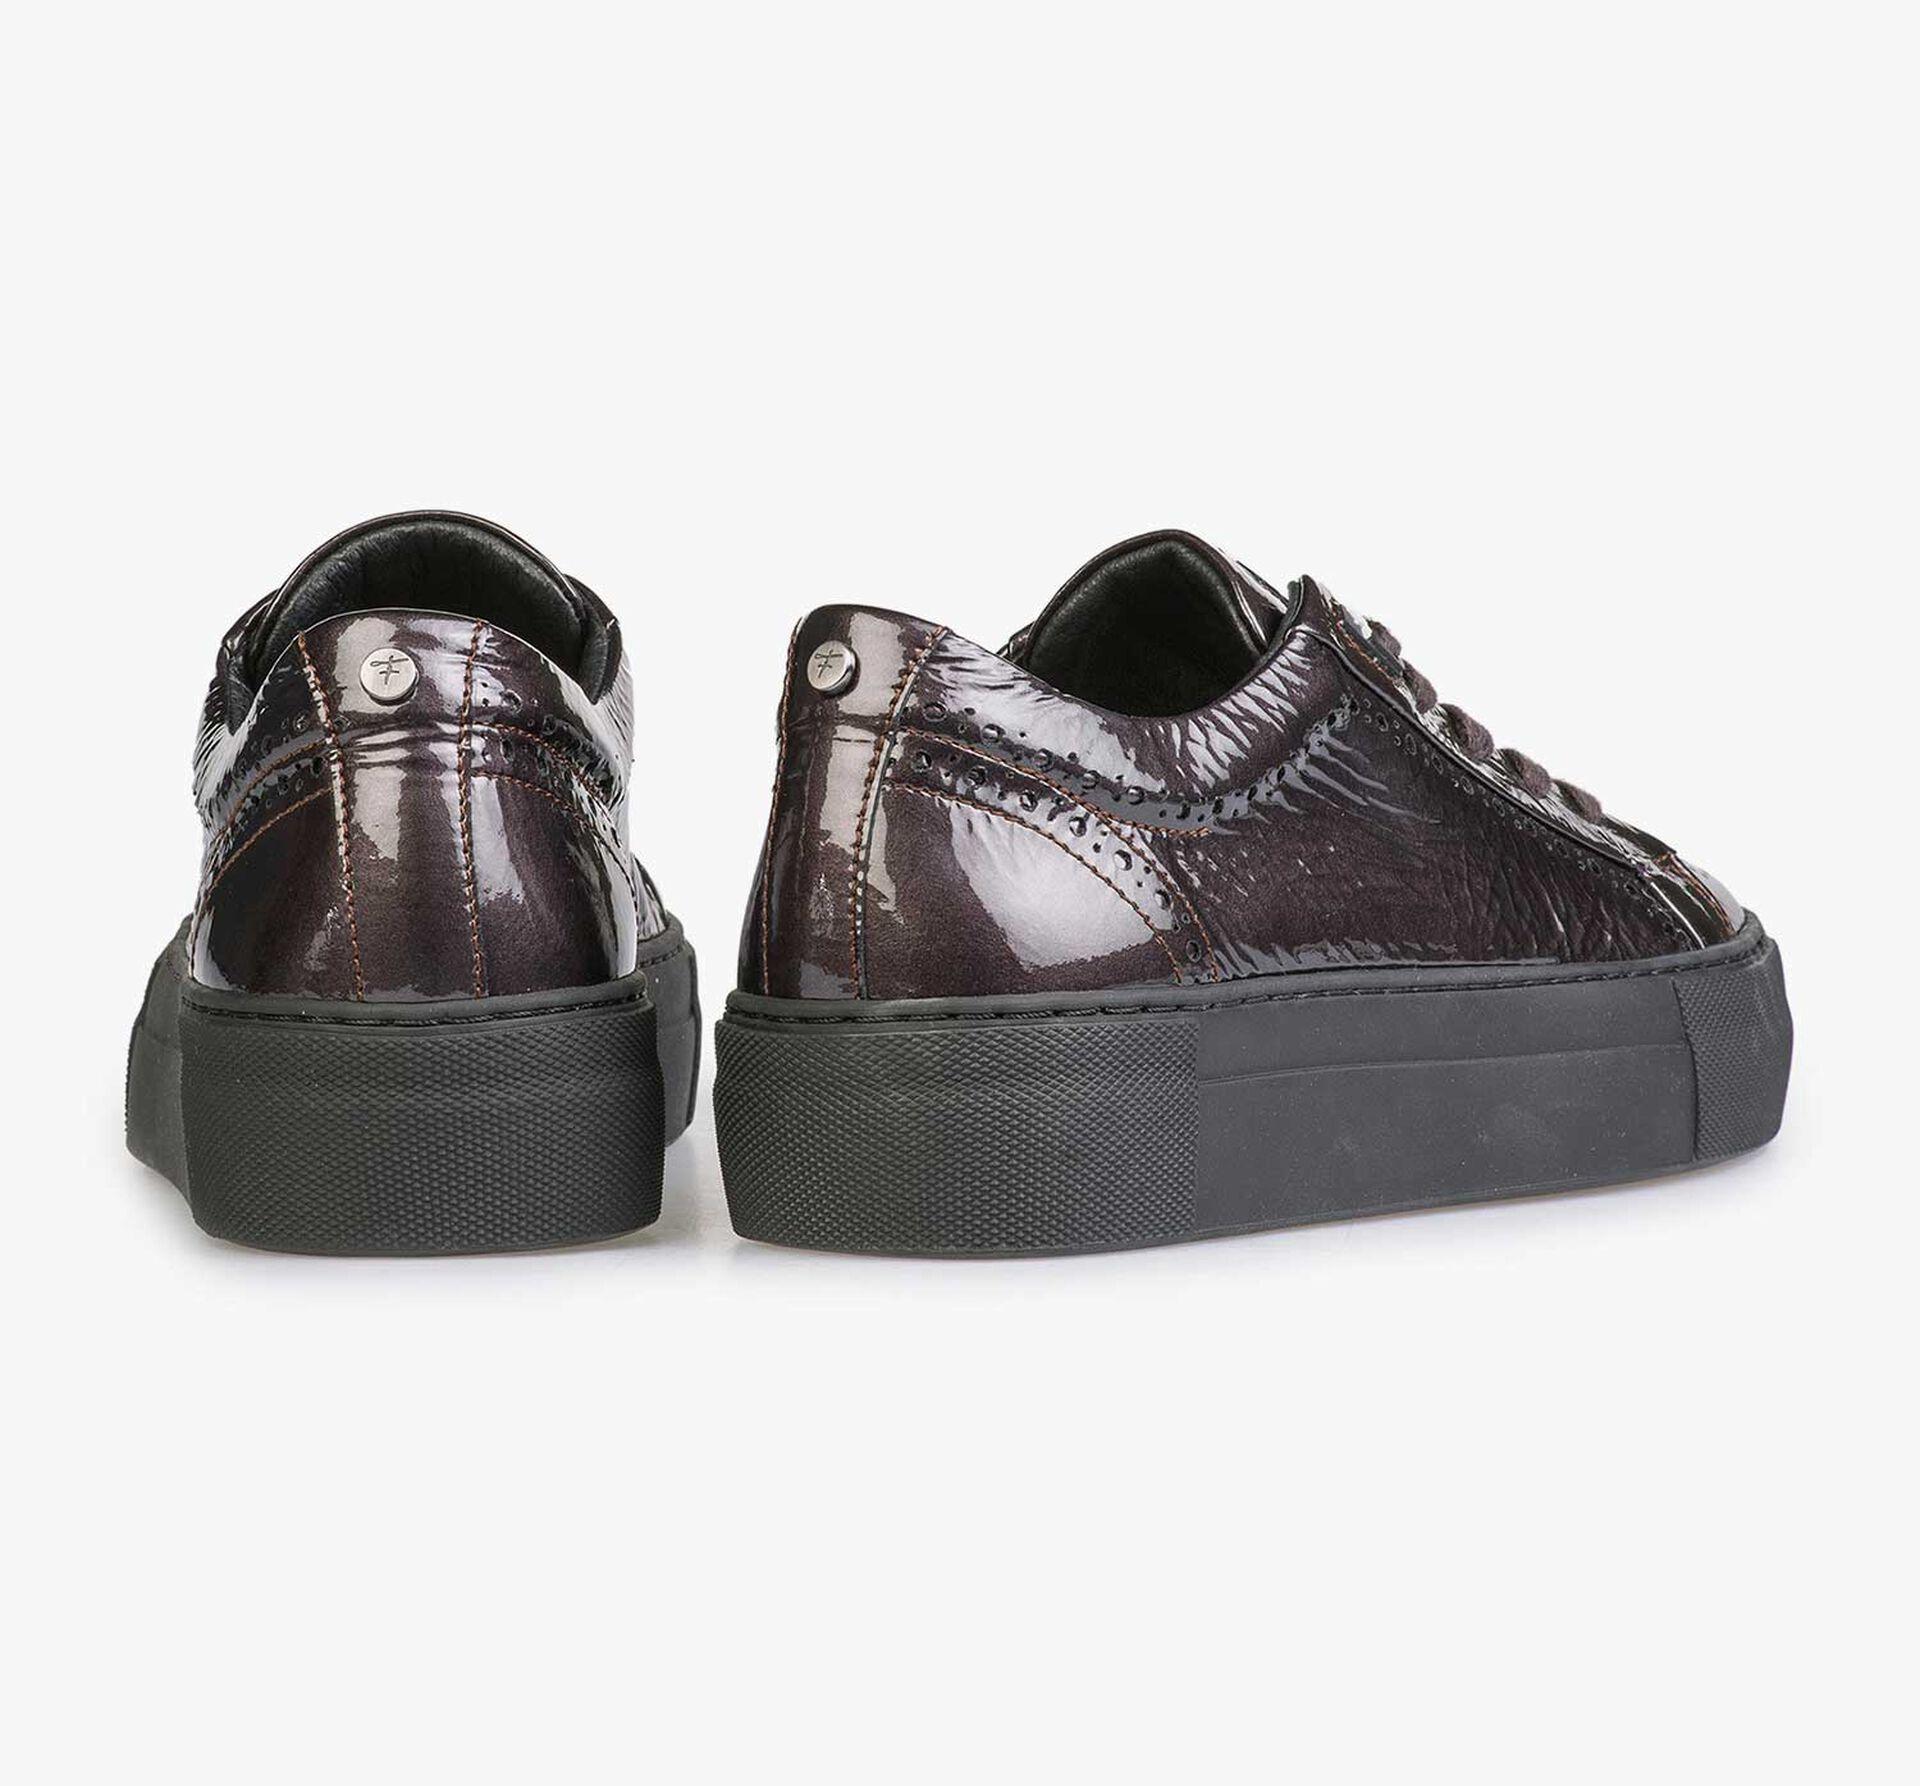 Bordeauxroter und taupefarbener Lackleder-Sneaker mit Knittereffekt